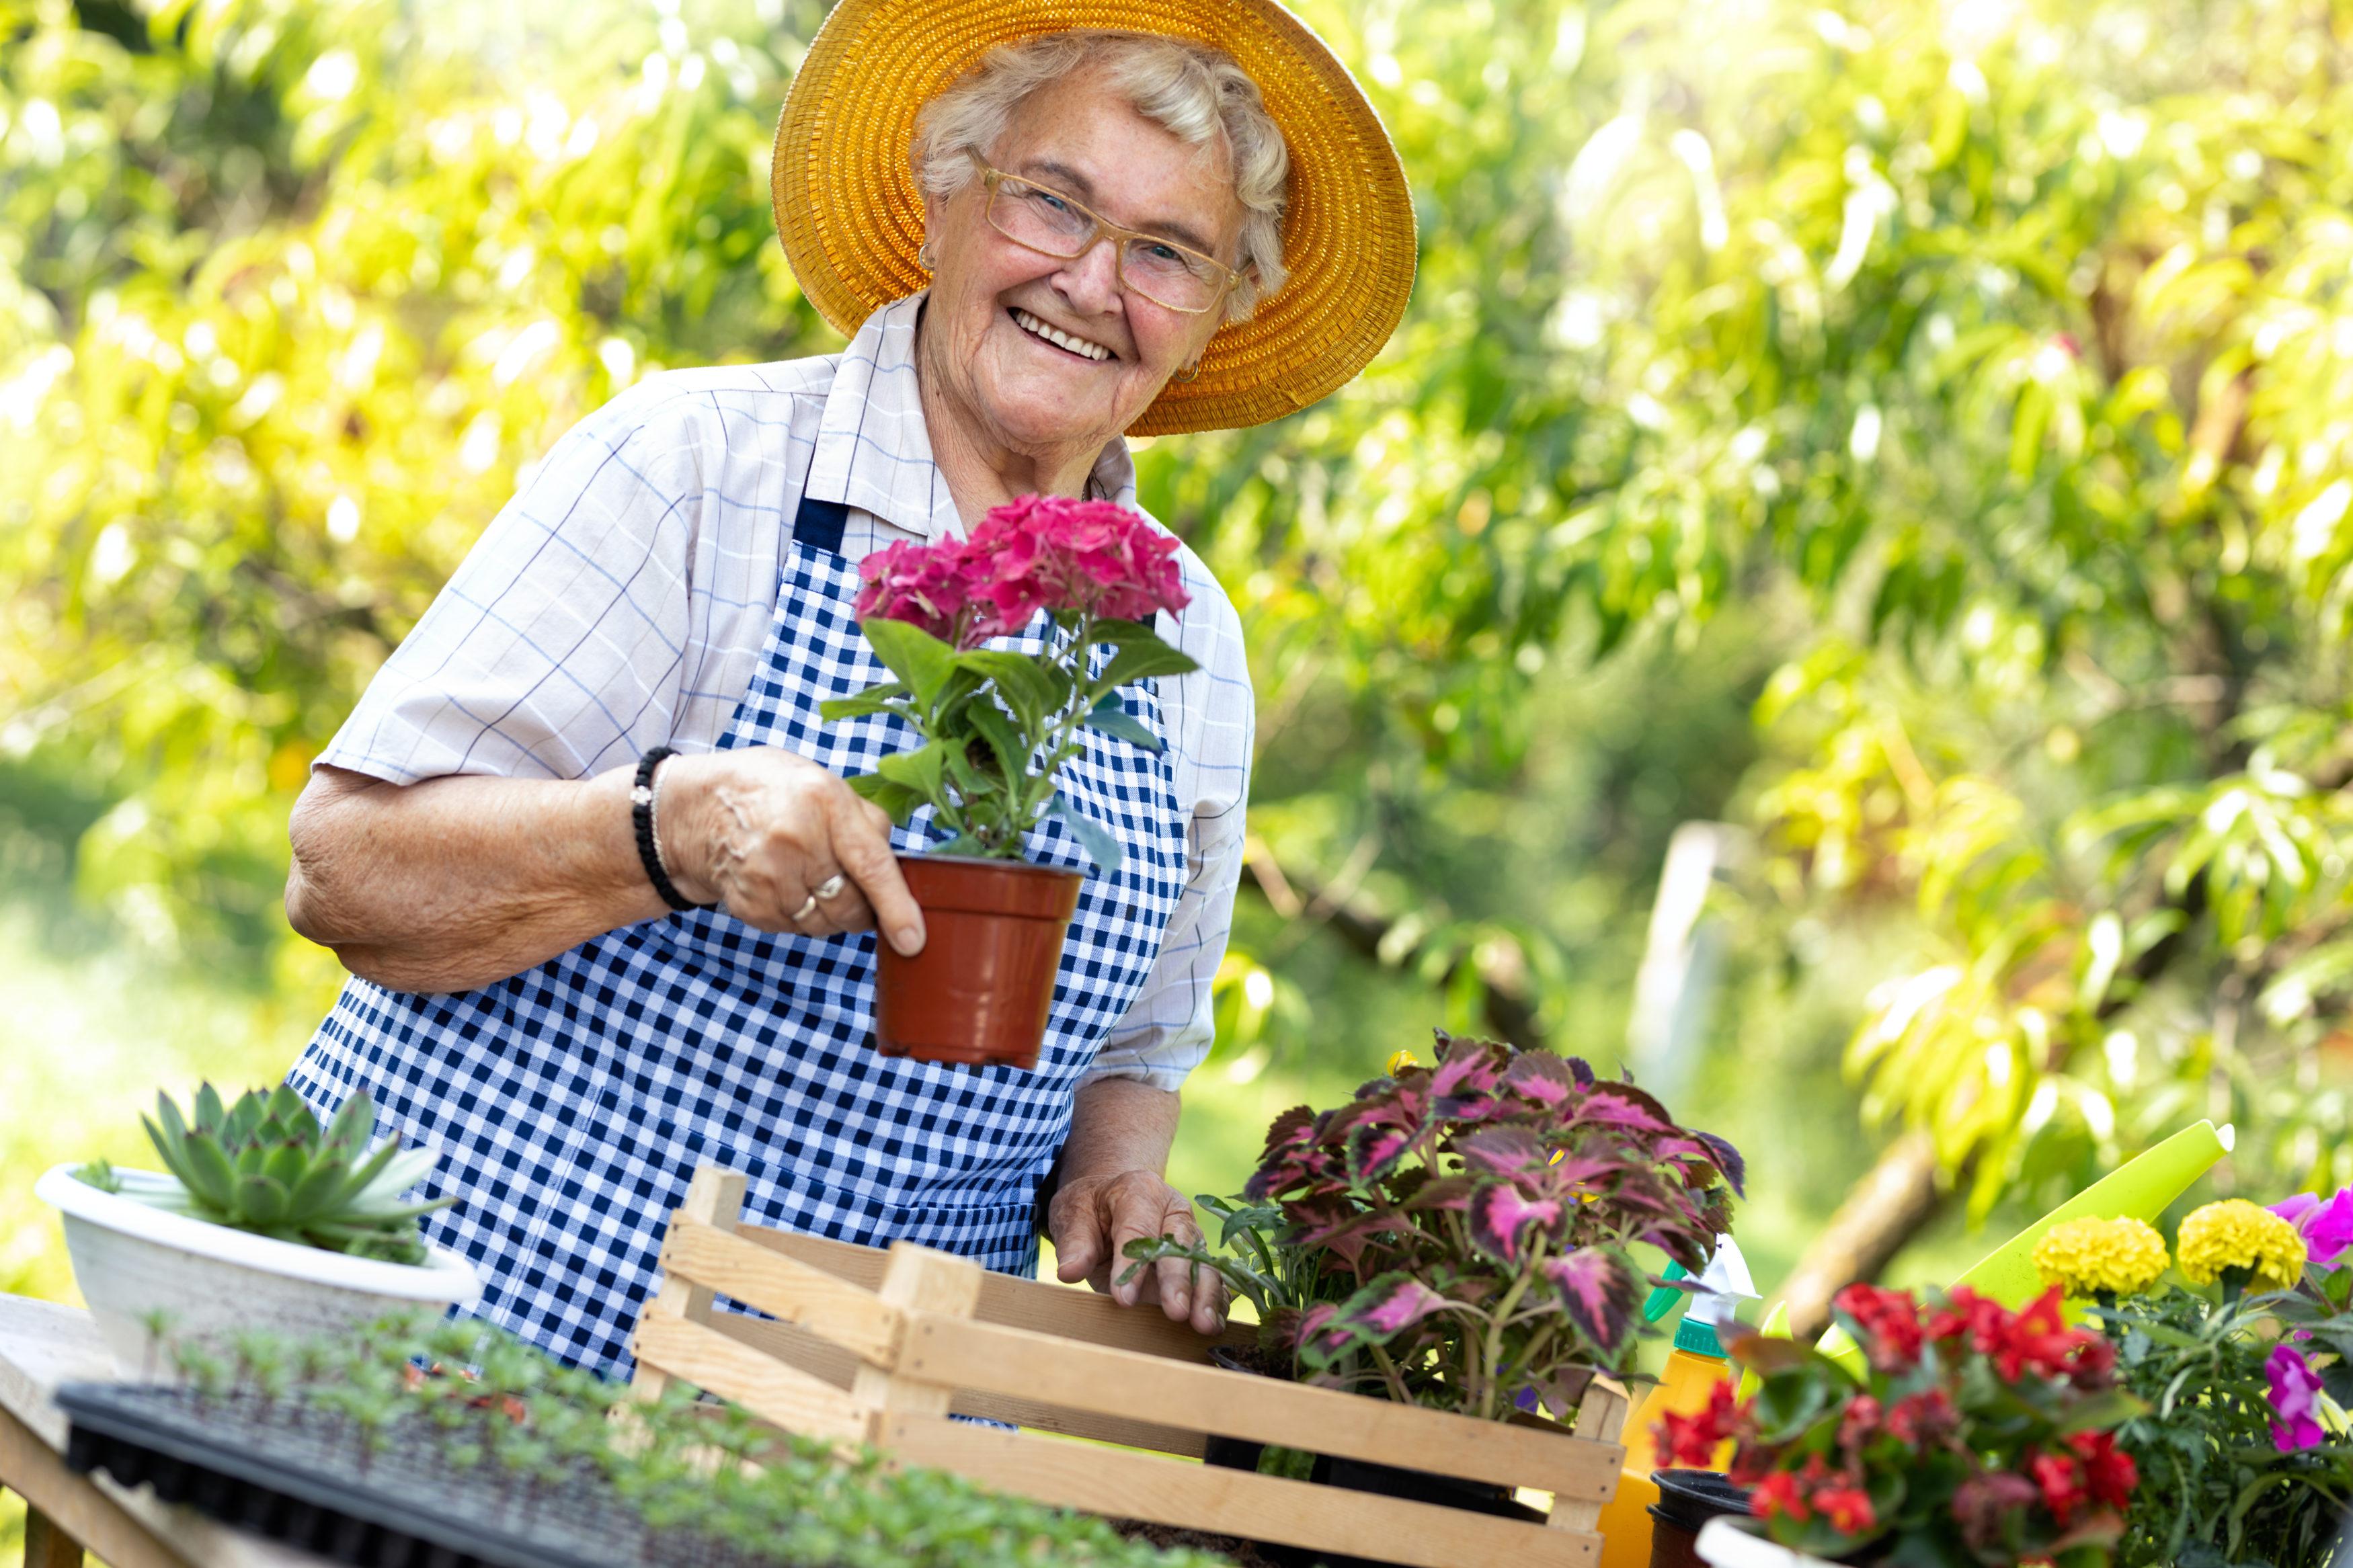 Senior woman gathering flowers in garden. Elderly woman smelling her blooming flowers.